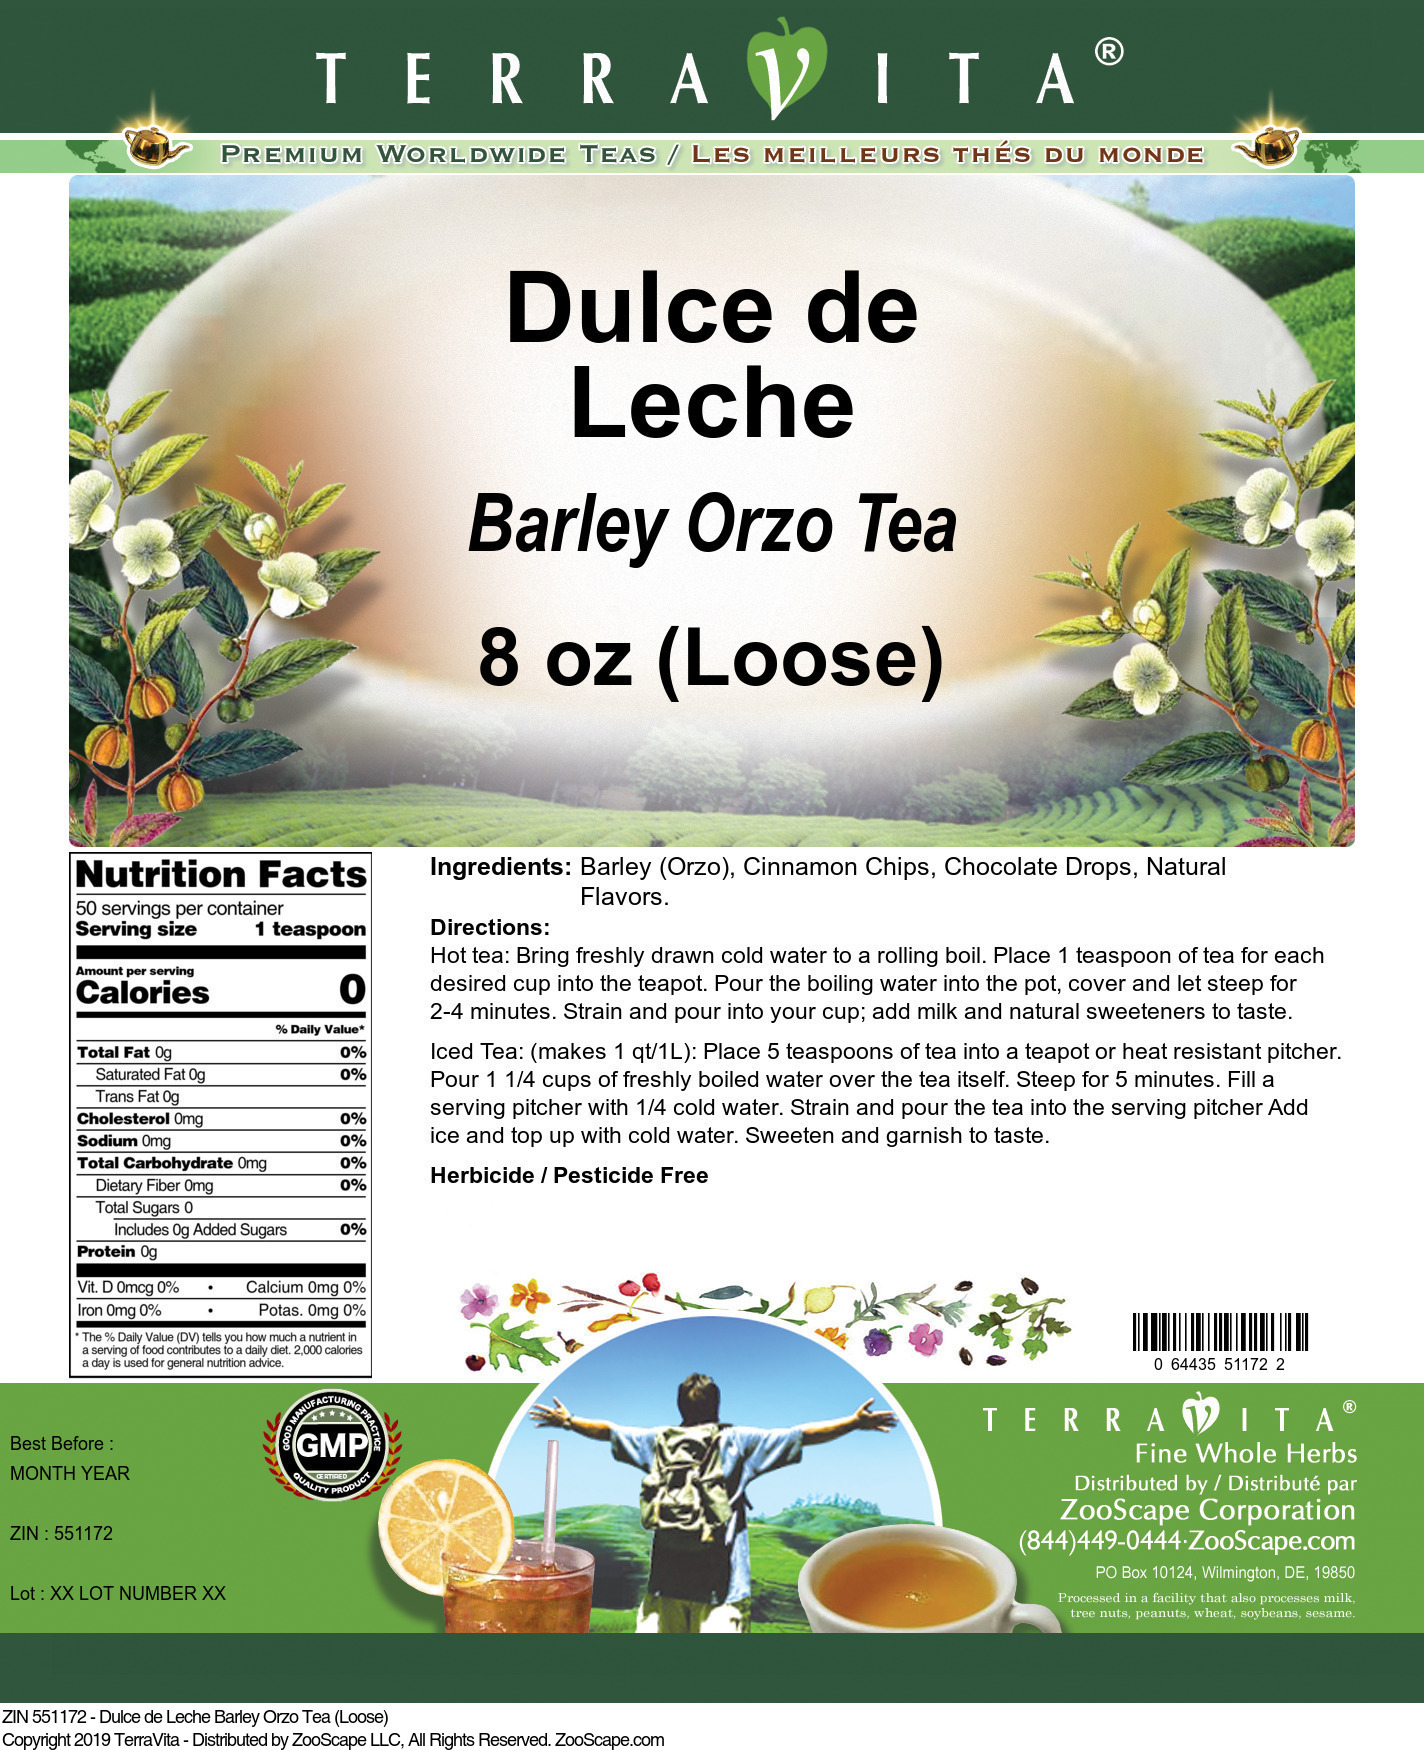 Dulce de Leche Barley Orzo Tea (Loose)